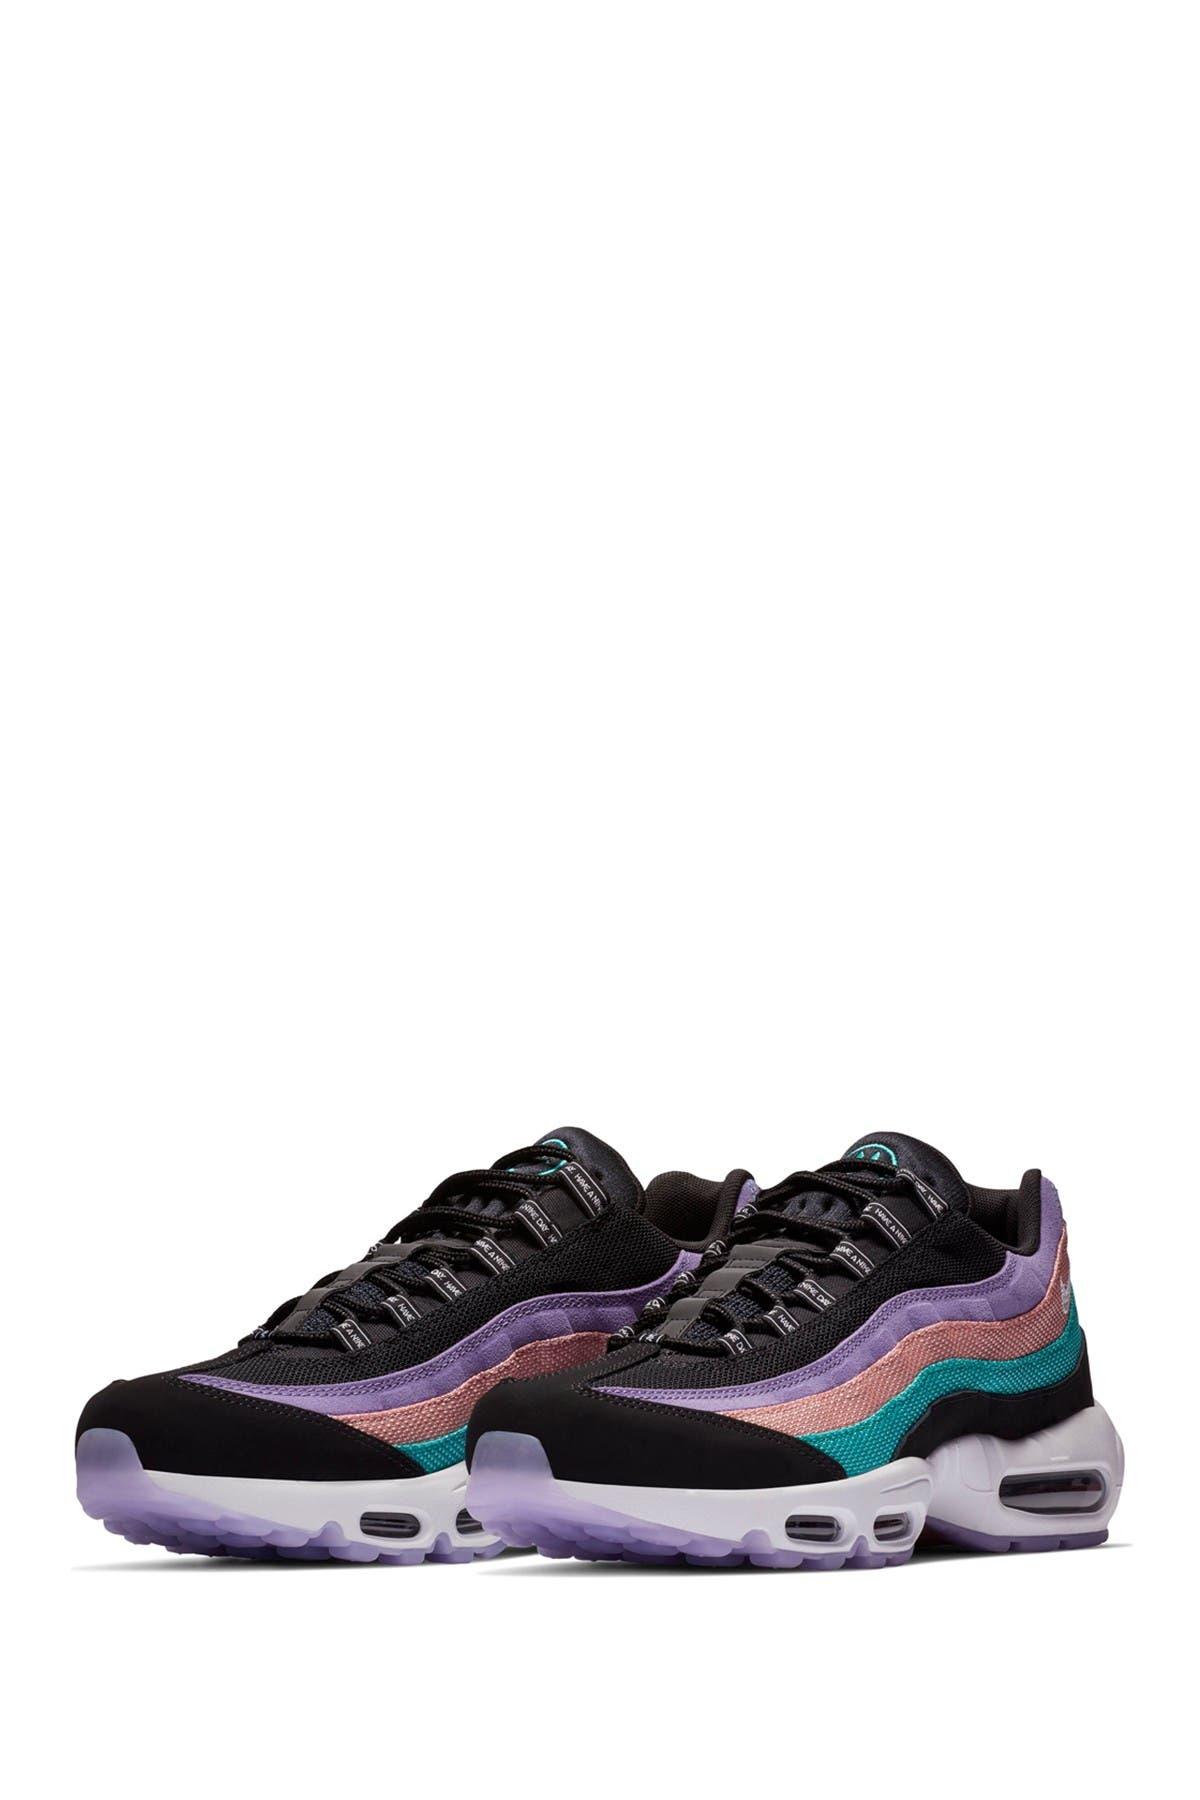 Nike   Air Max 95 ND Sneaker